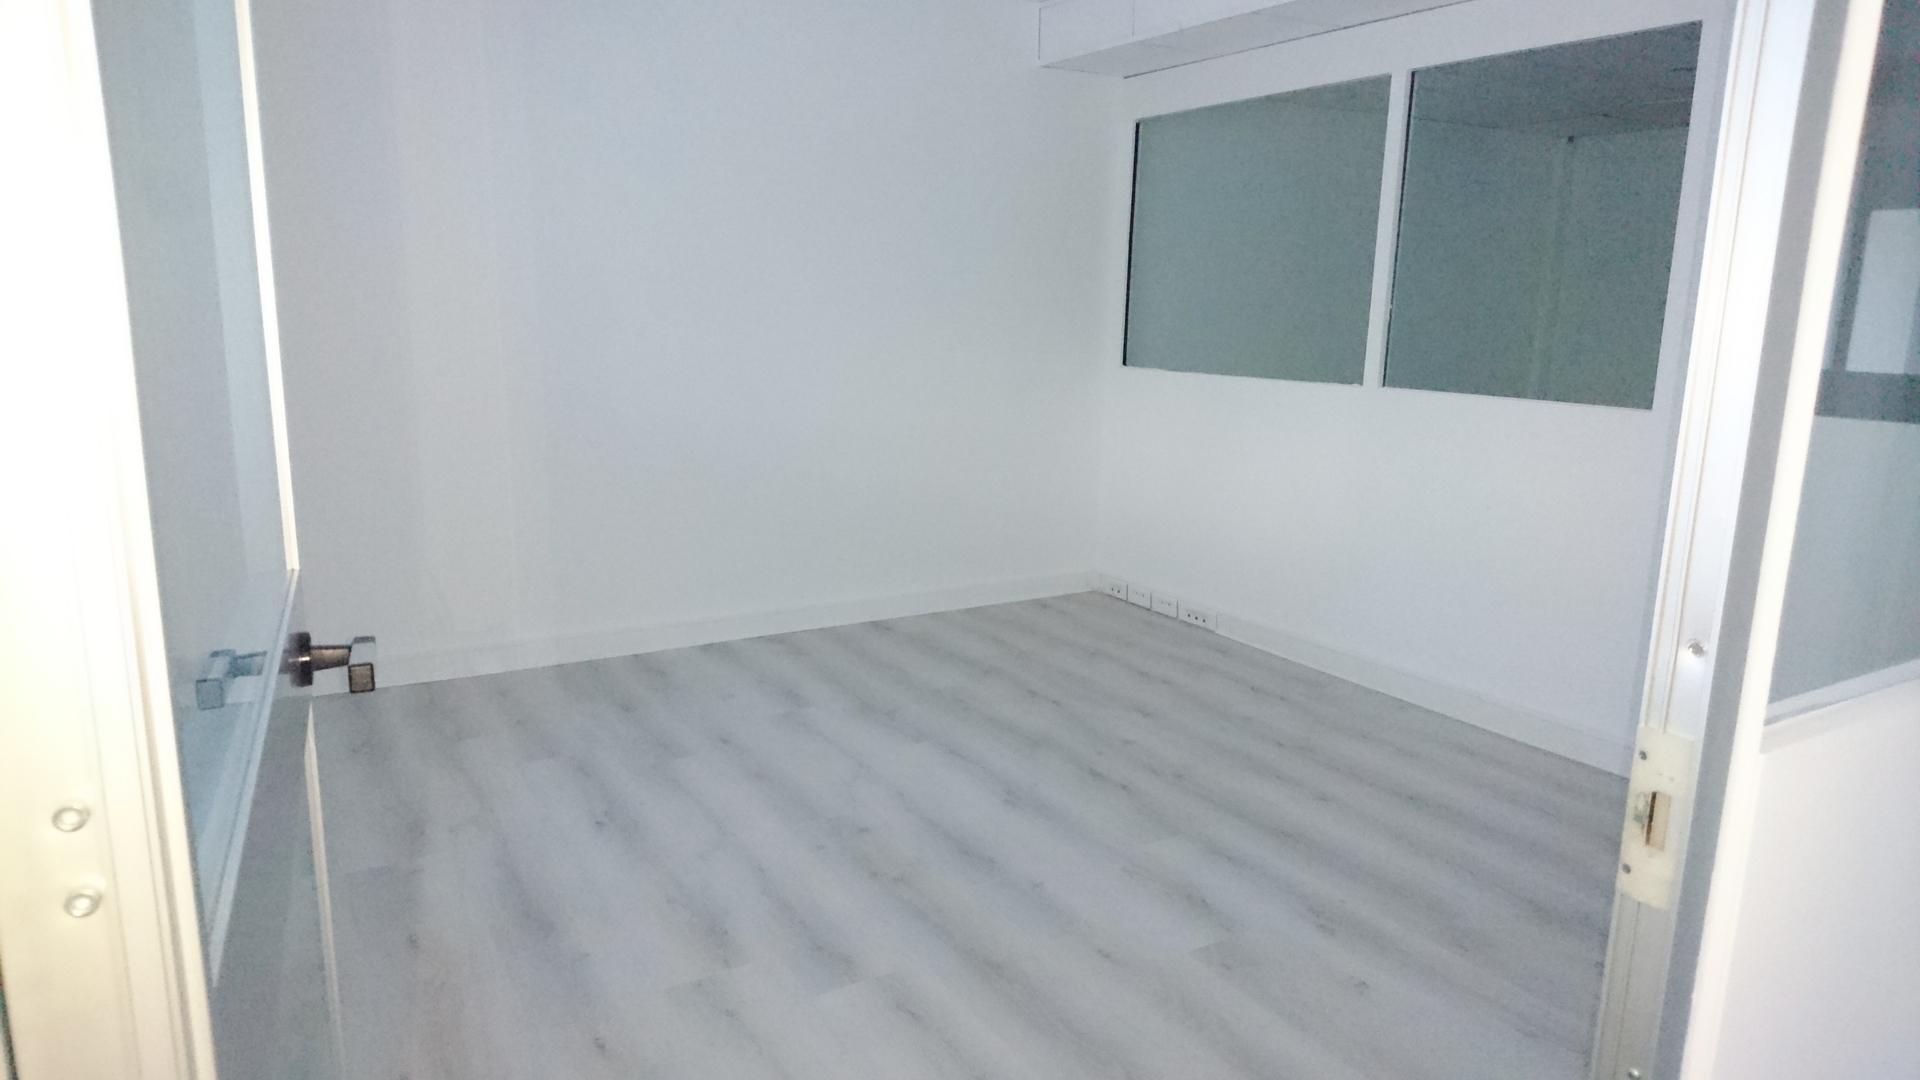 vente bureau administratif fontvieillle monaco monte carlo. Black Bedroom Furniture Sets. Home Design Ideas